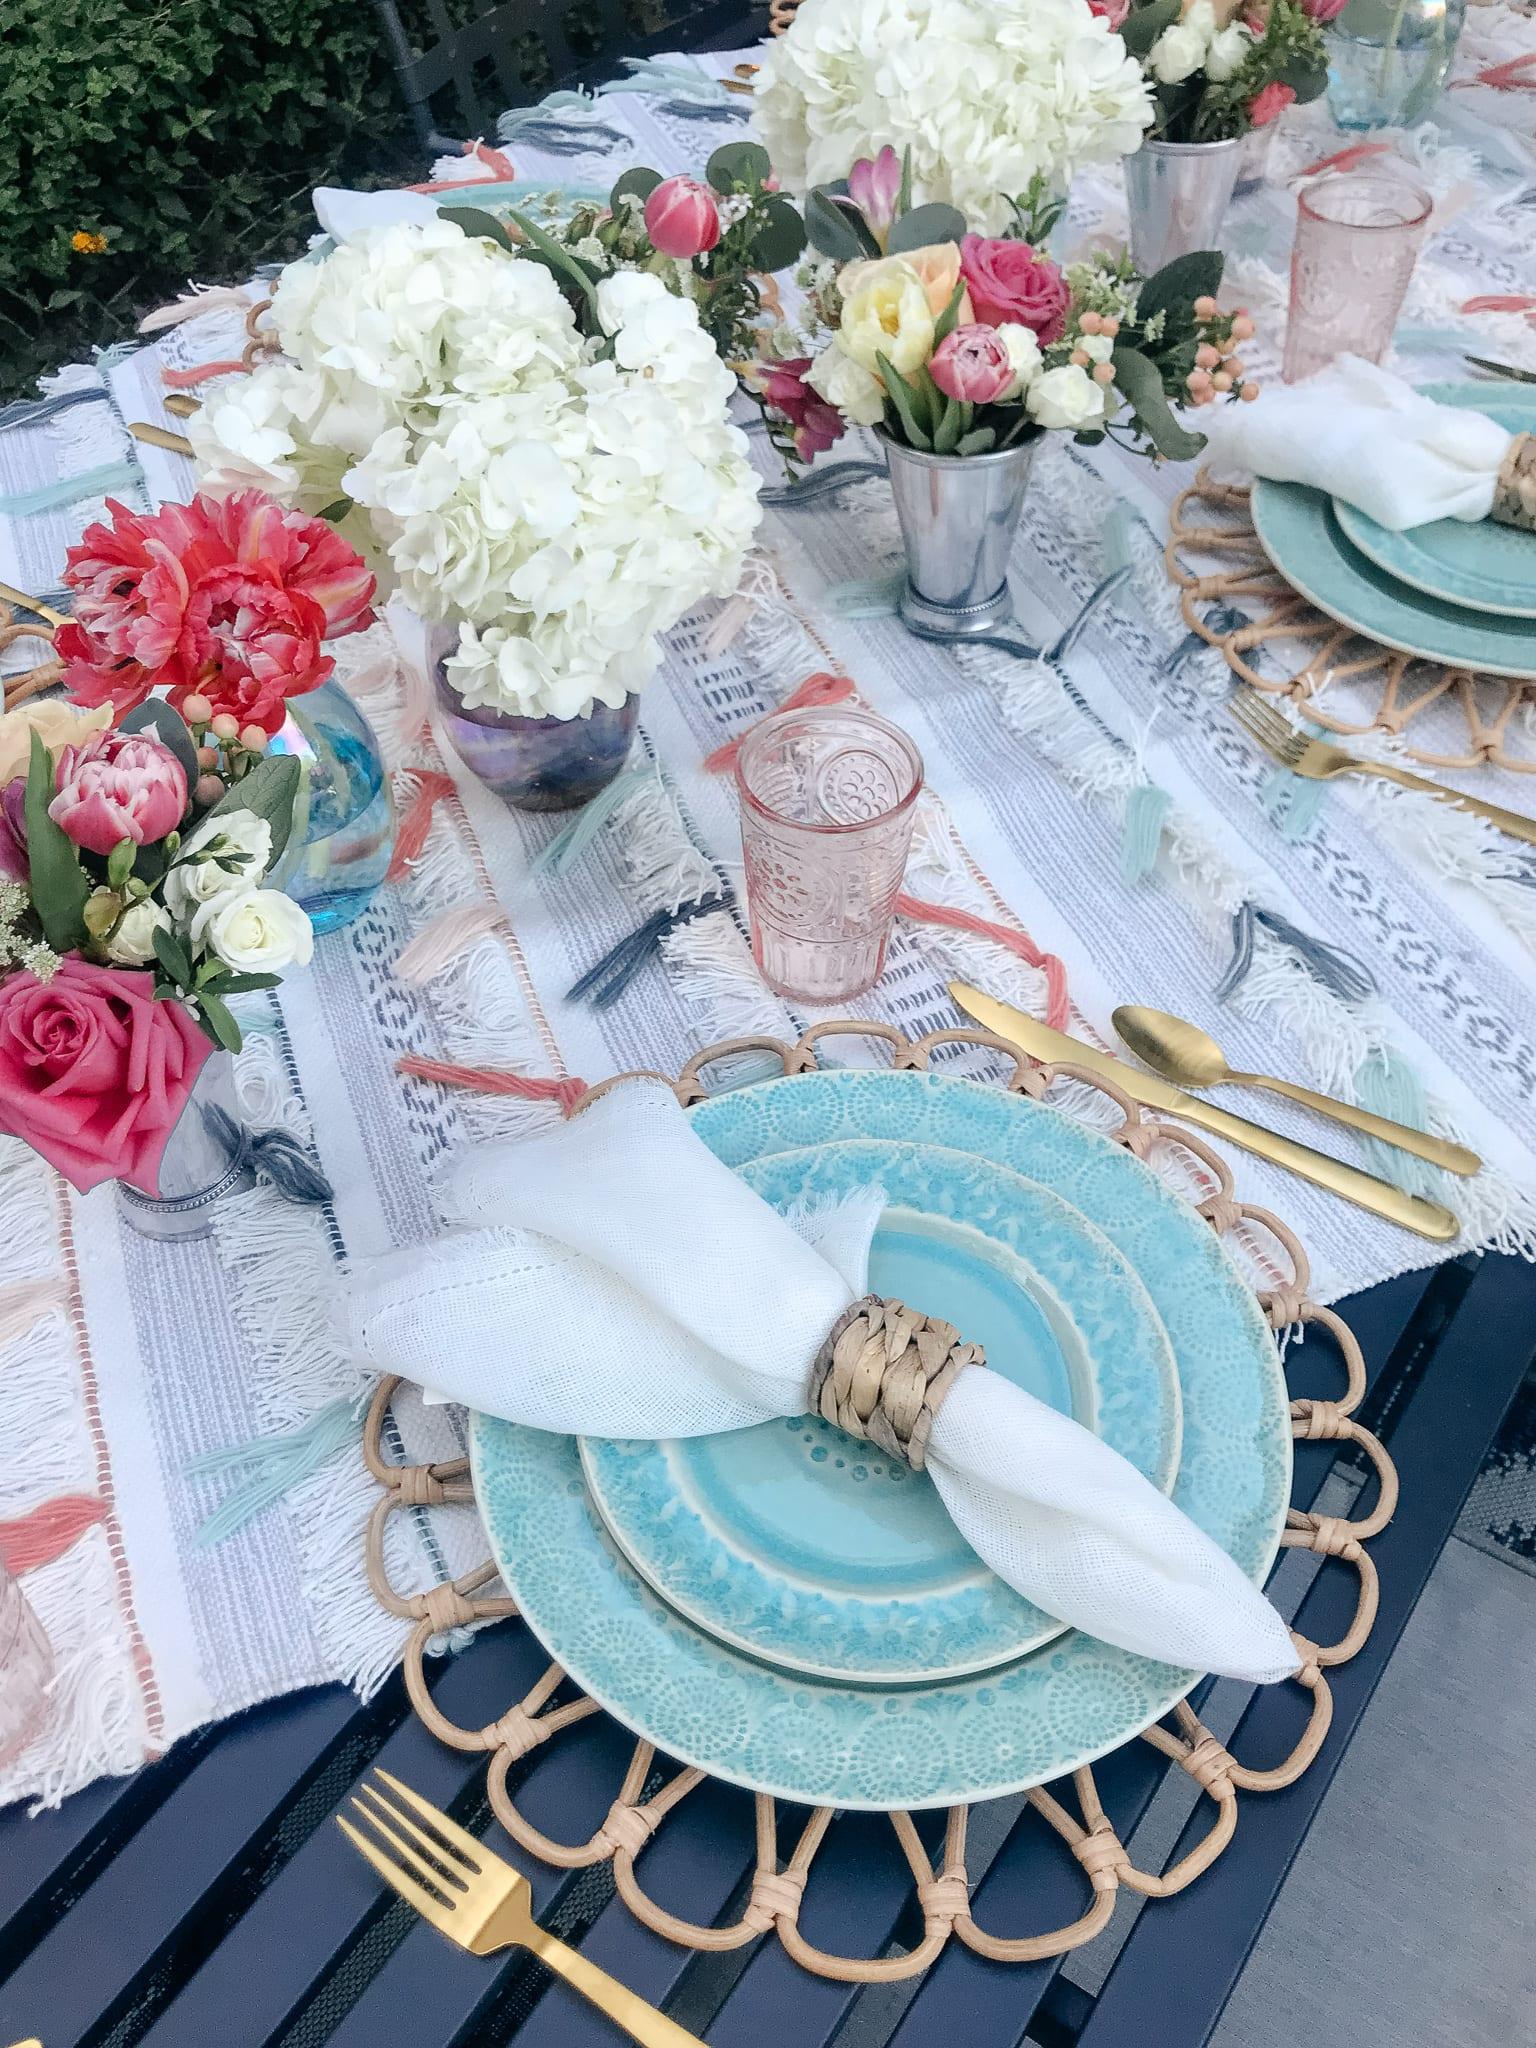 outdoor entertaining, glasses, goblets, dinnerware, place setting, backyard dinner party, hostess, napkins, napkin rings, flatware